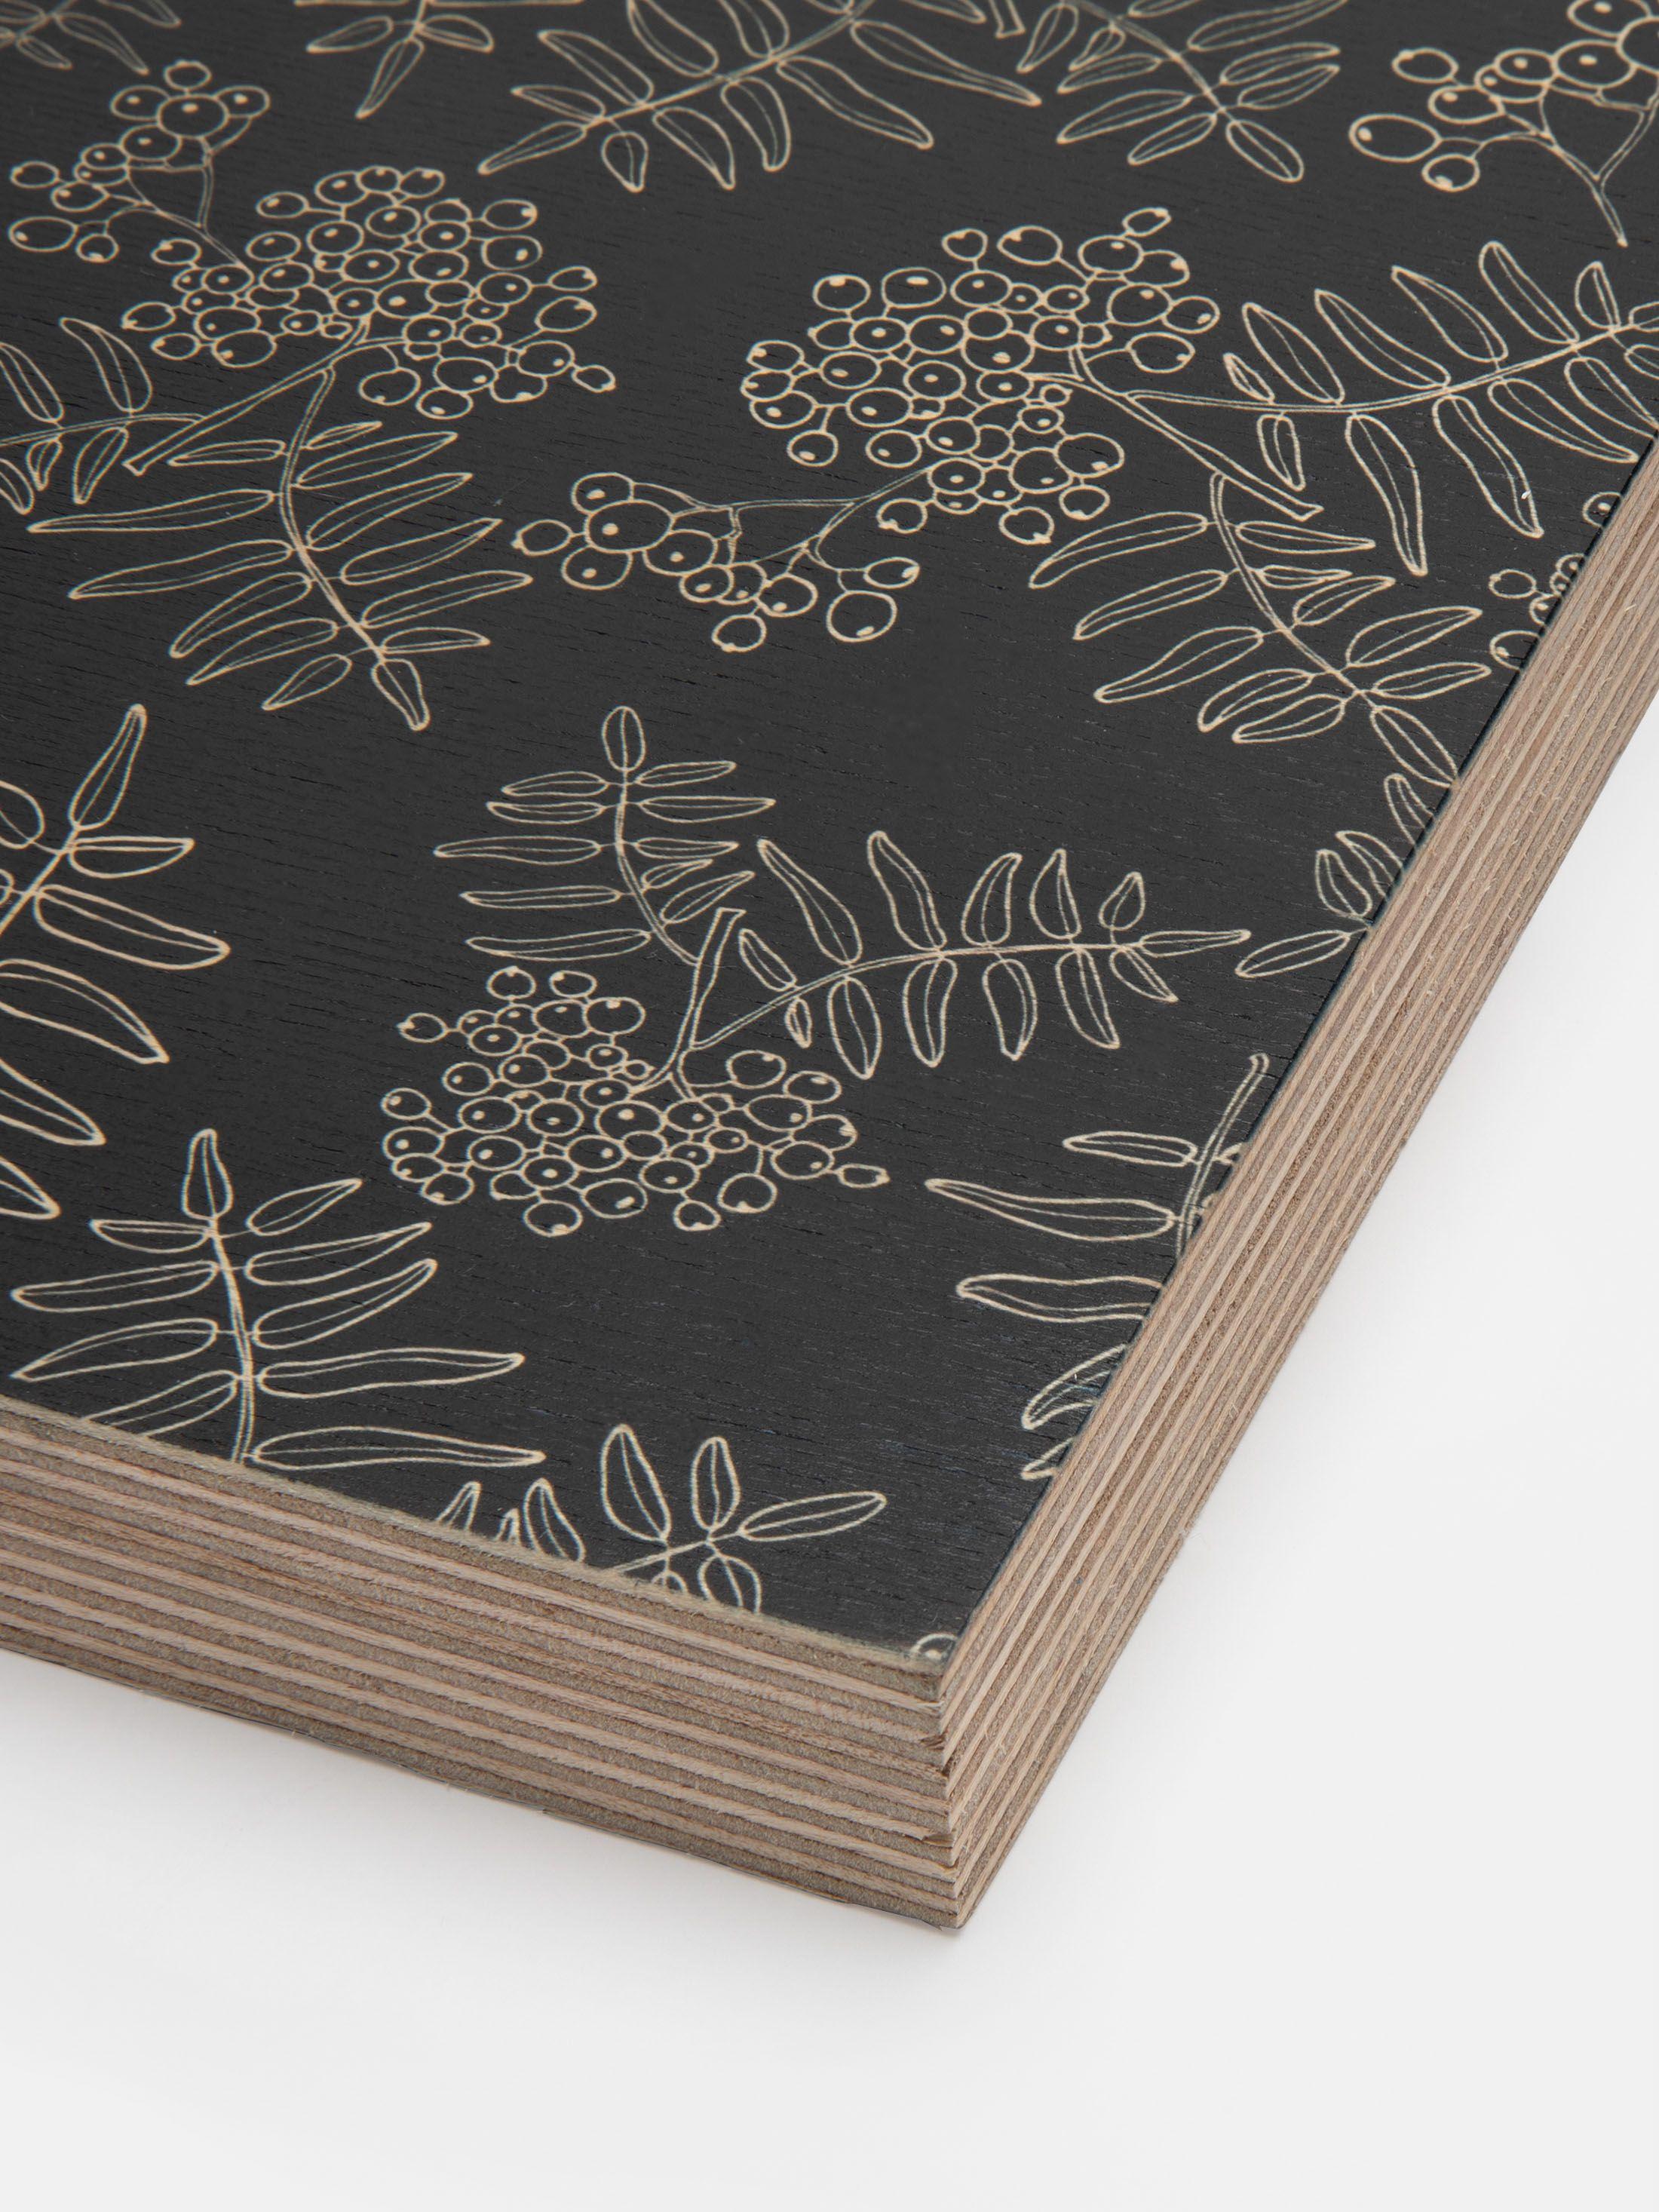 Printing on Wooden Blocks